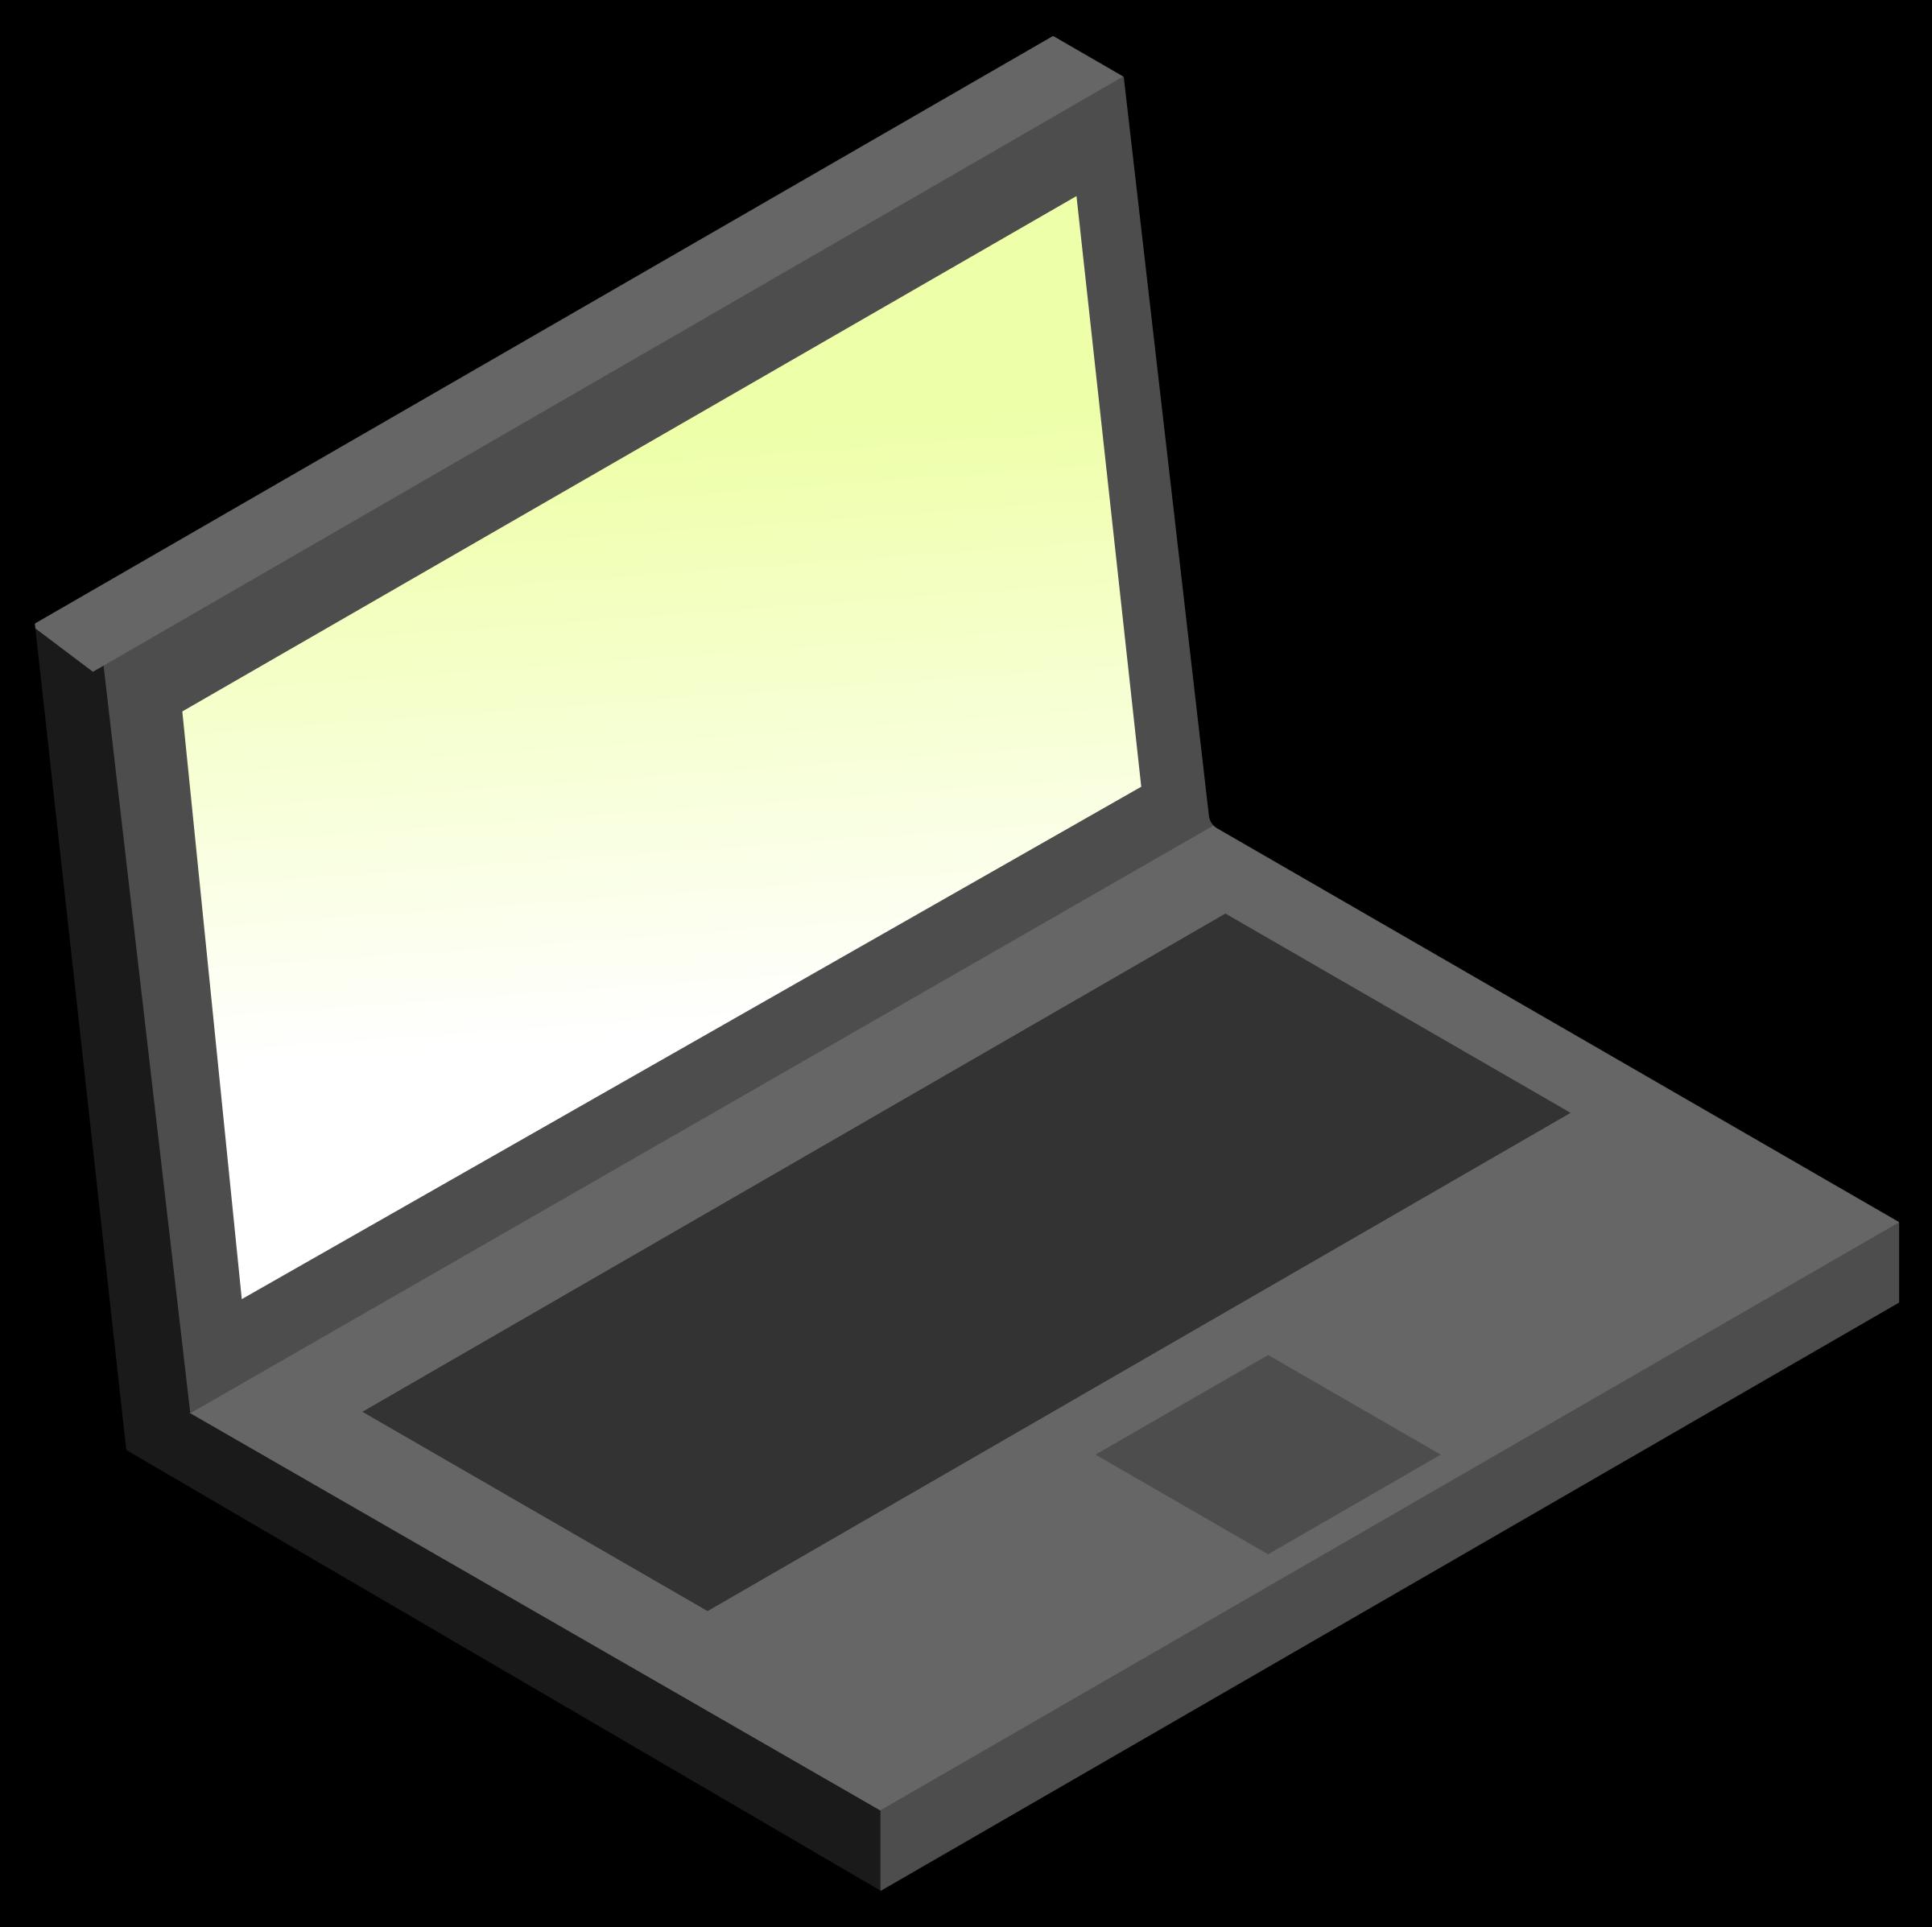 2400x2394 Laptop Transparent Free Images Only Clip Art